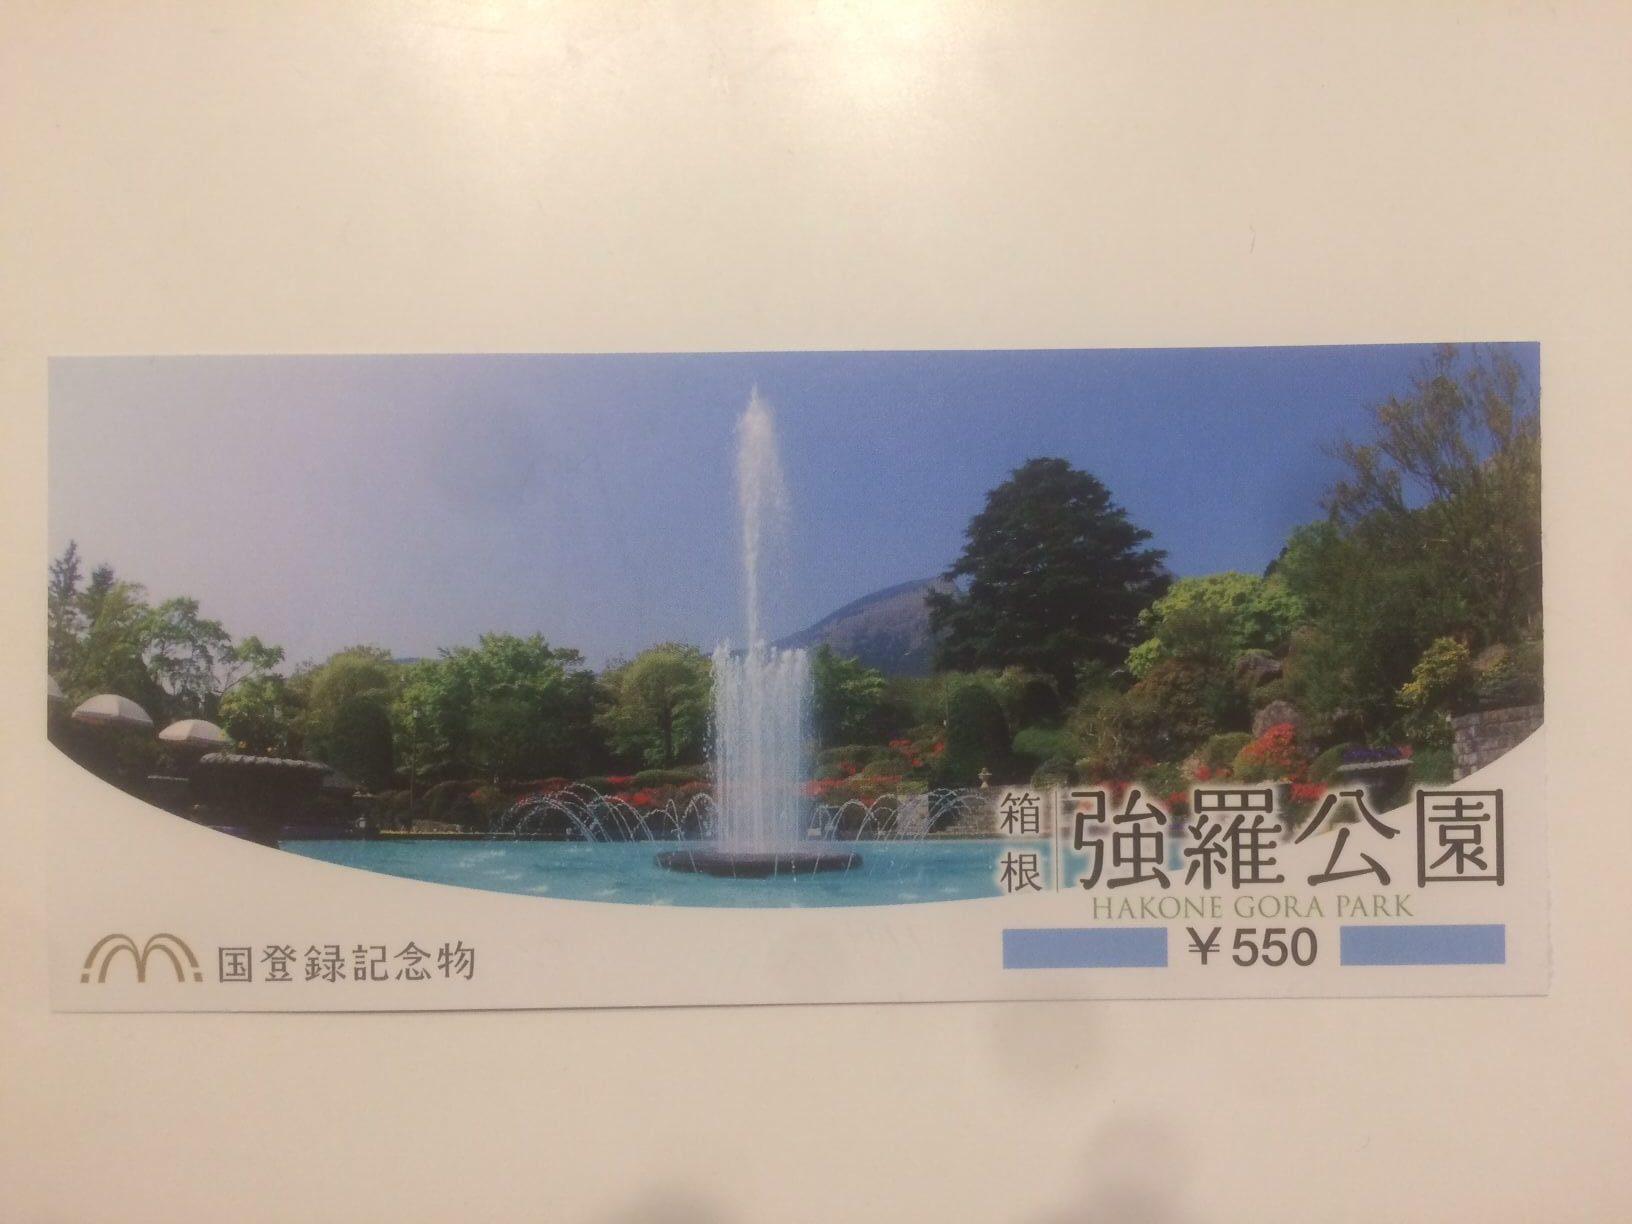 強羅公園の入場券